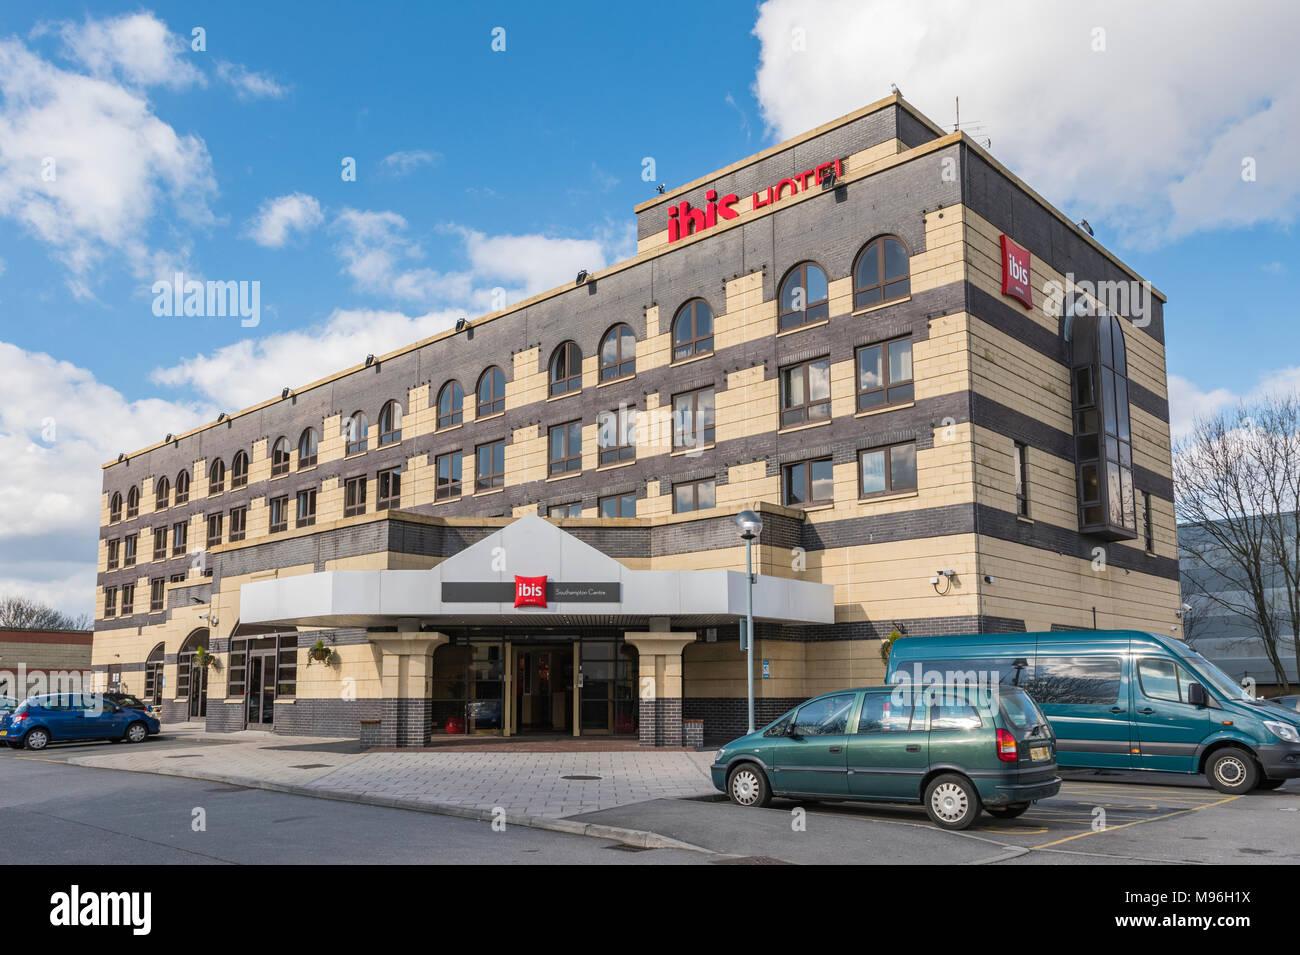 Ibis hotel building in Southampton, Hampshire, England, UK. - Stock Image